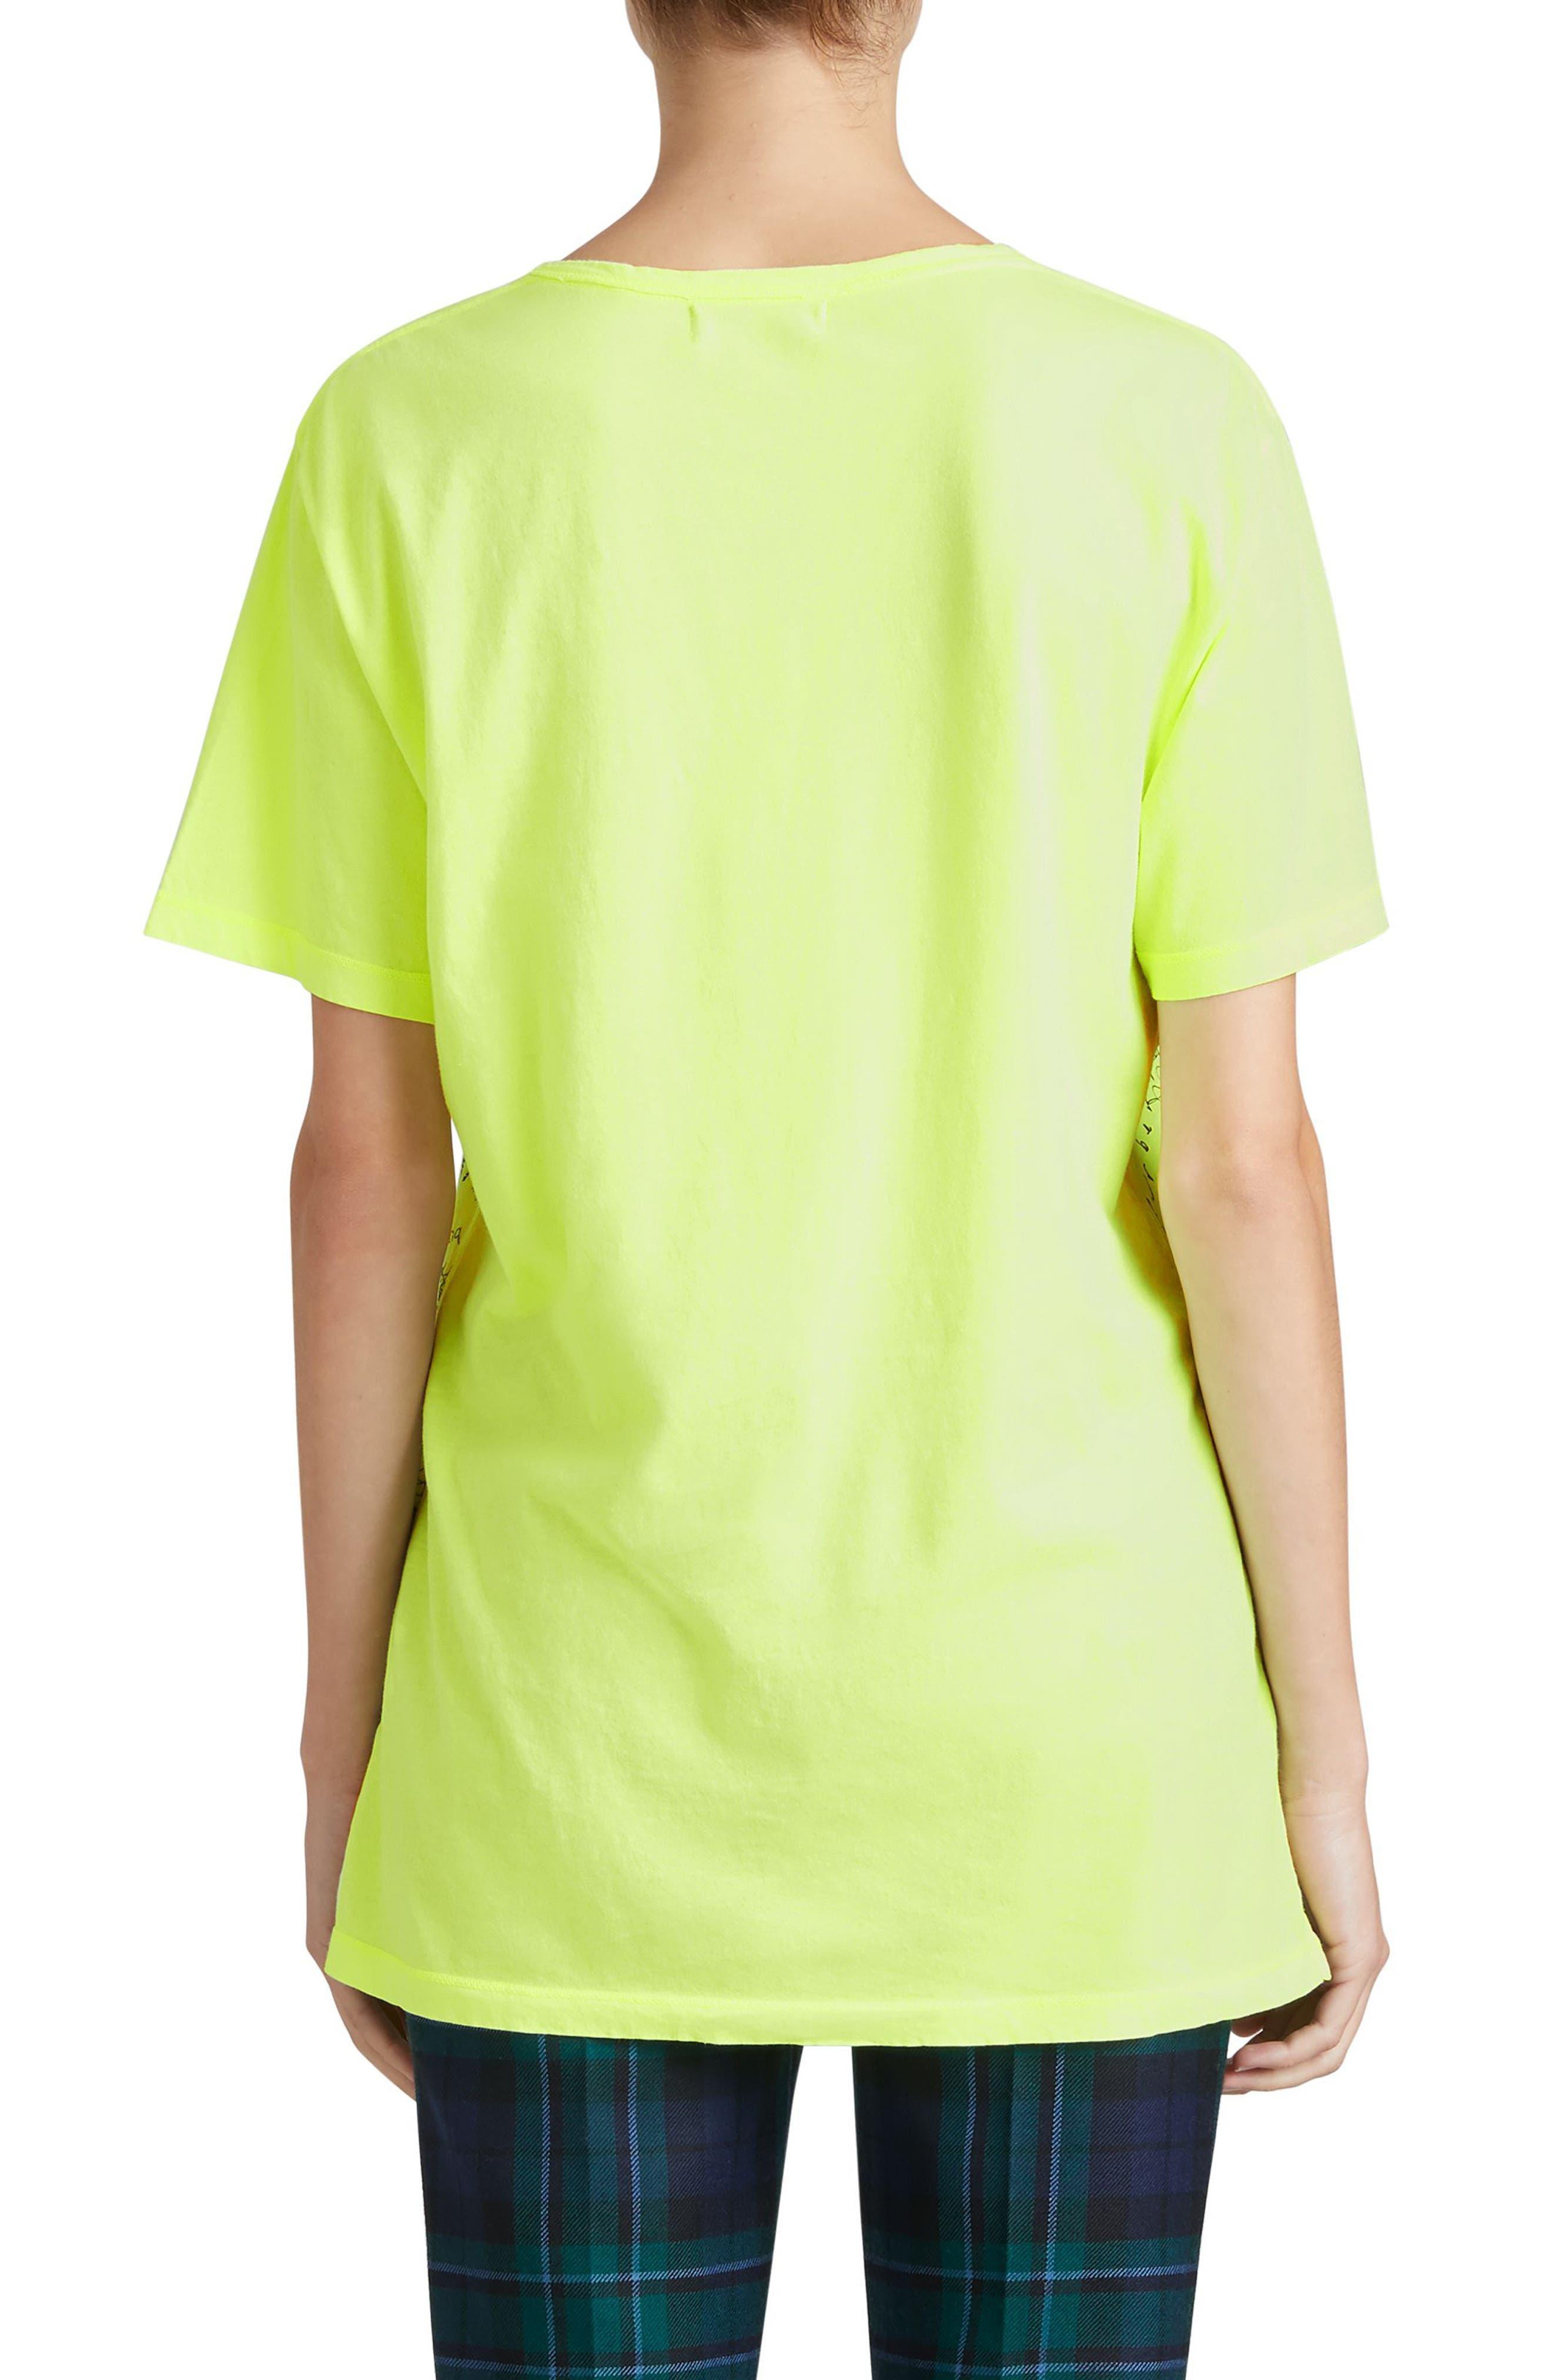 Rydon Print Cotton Tee,                             Alternate thumbnail 2, color,                             Fluorescent Yellow